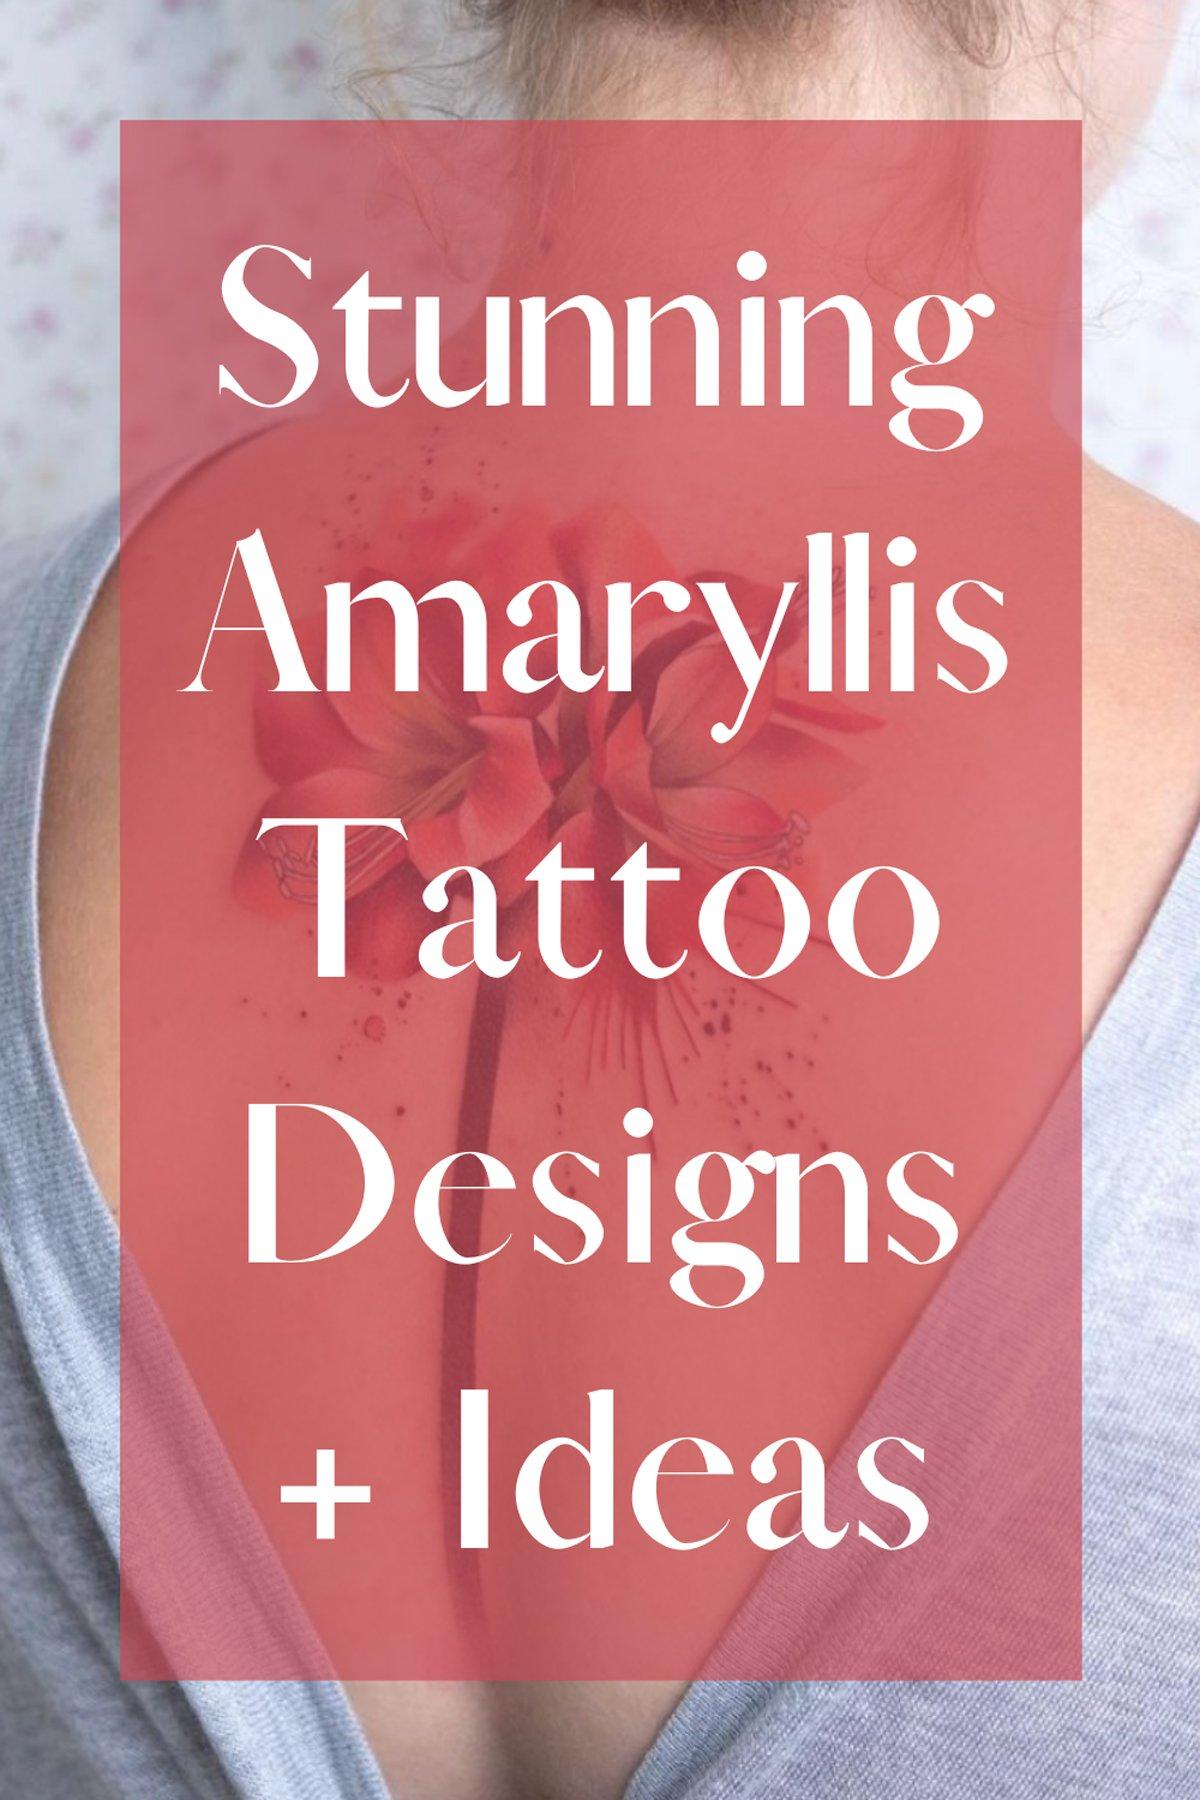 Amaryllis Tattoo Ideas